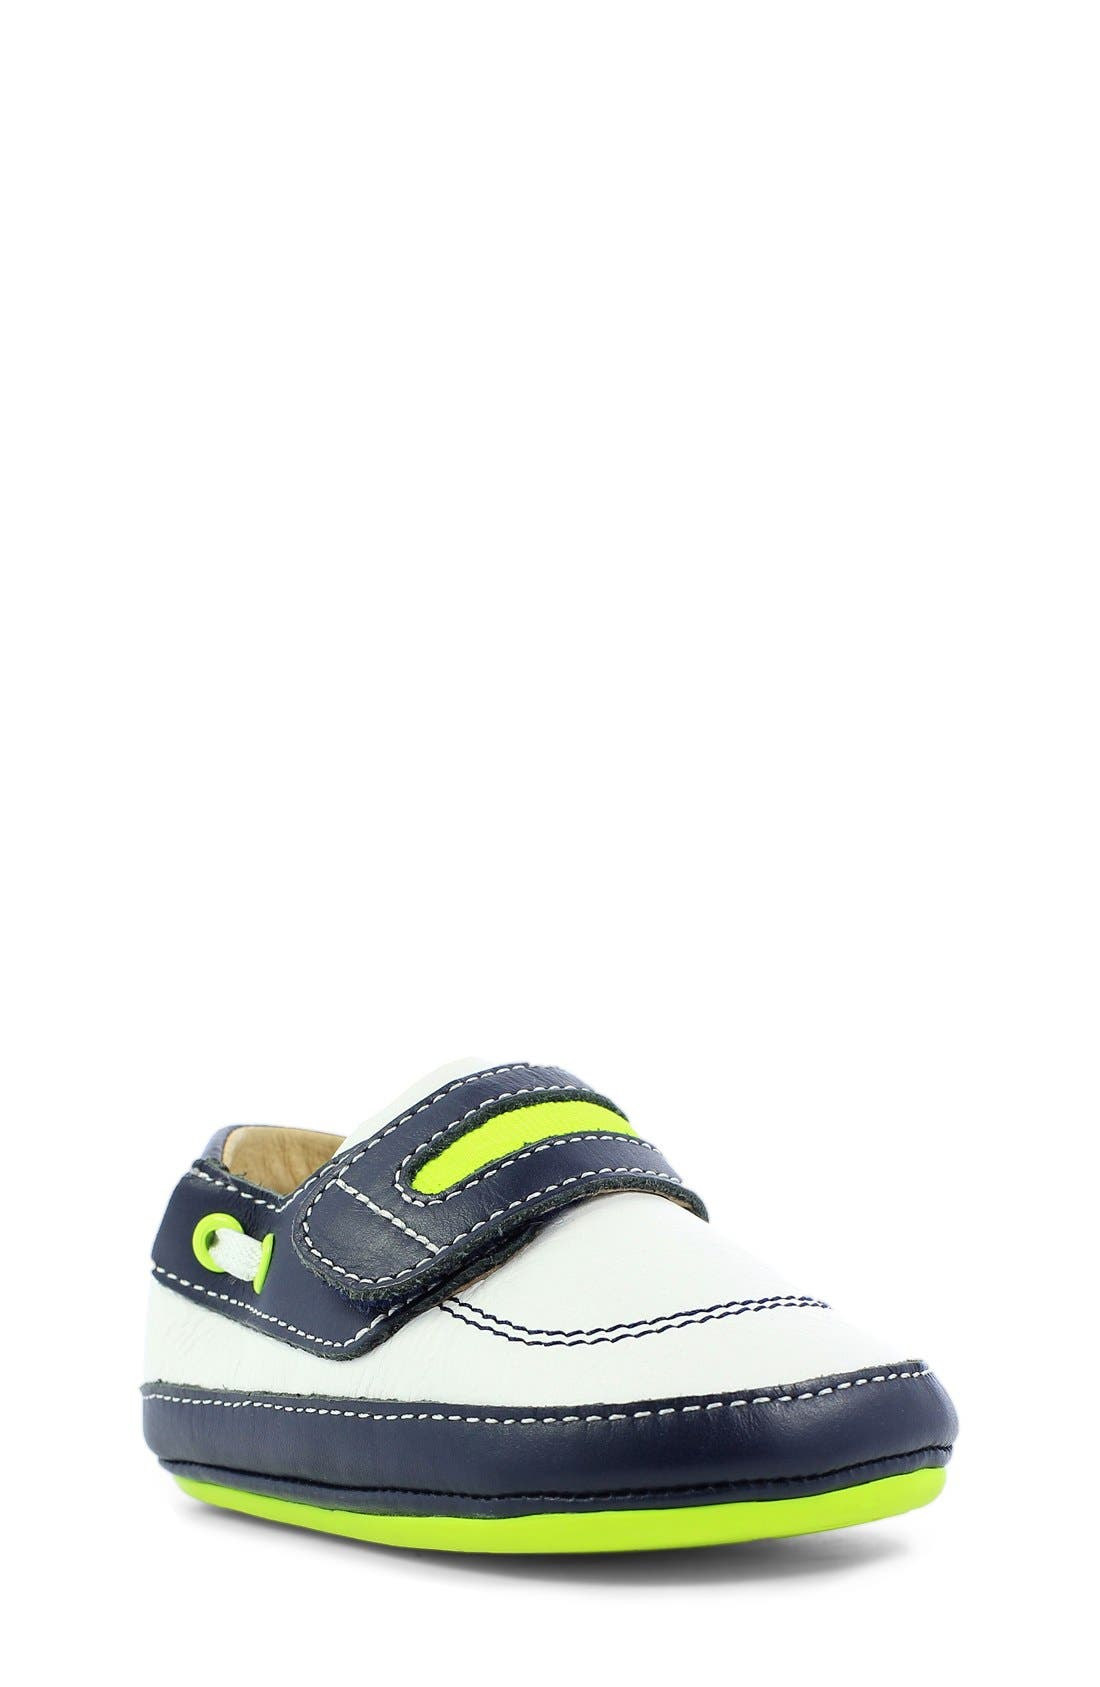 UMI 'Gene' Sneaker